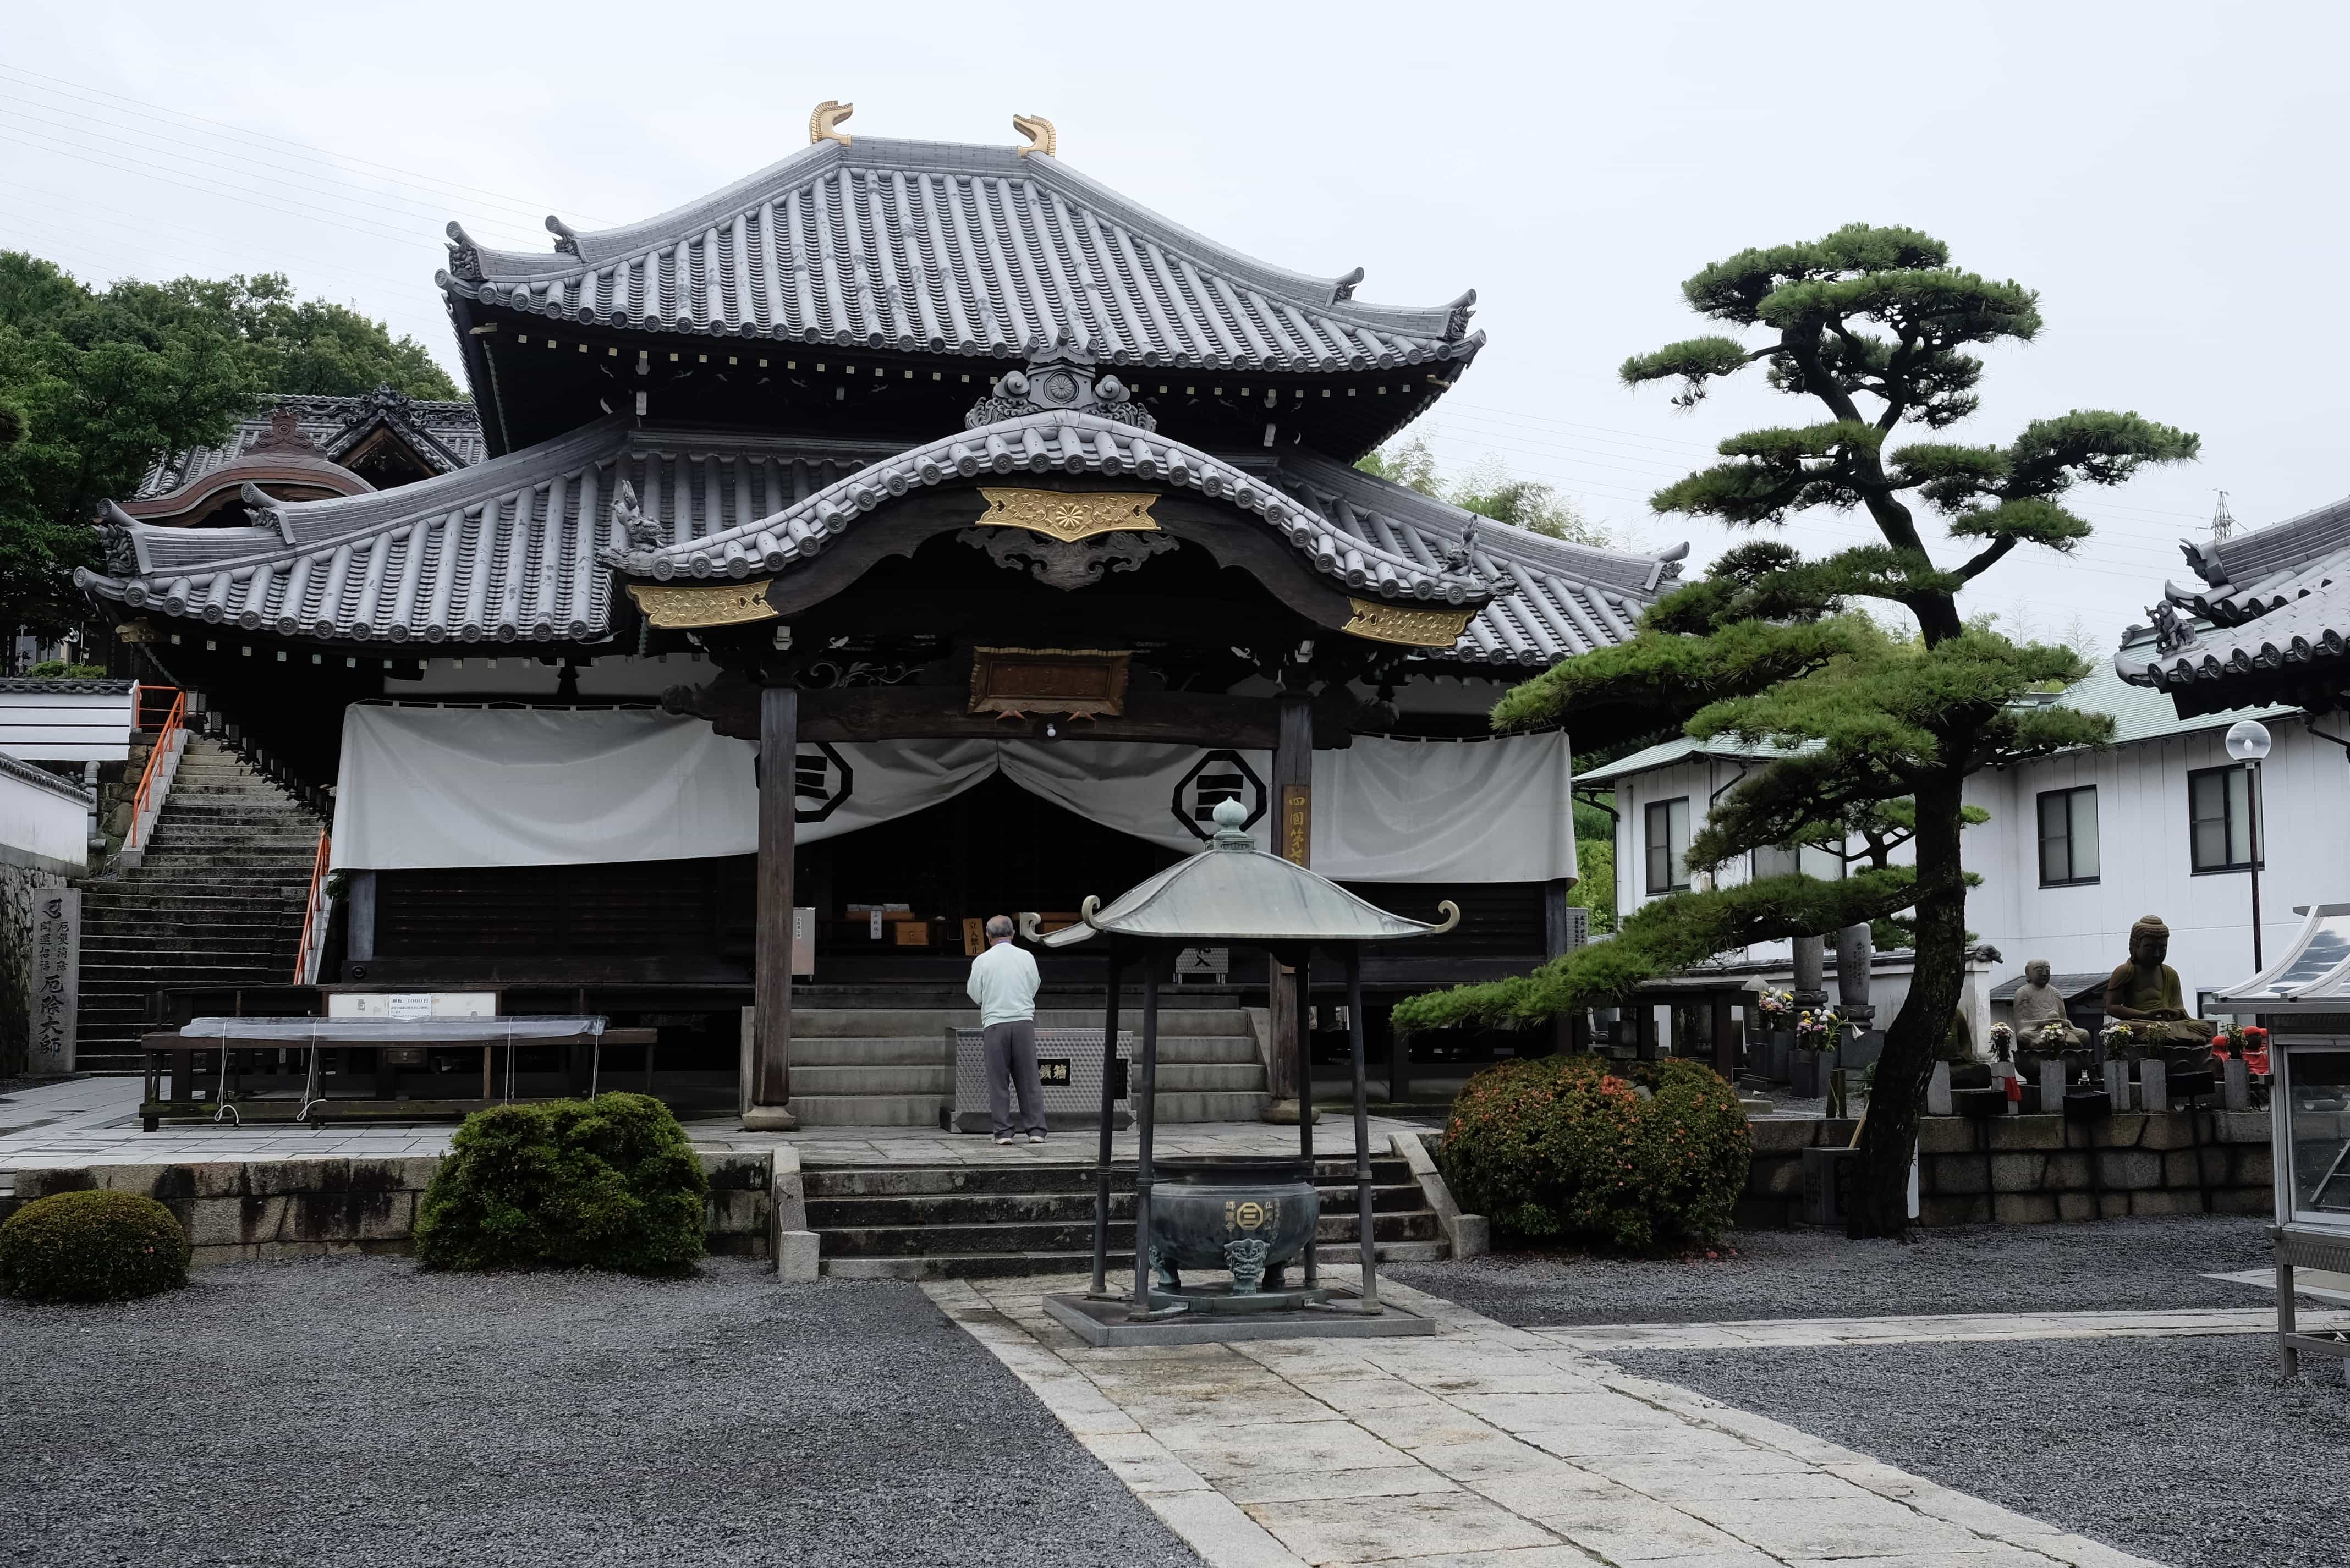 Gōshō-ji Temple